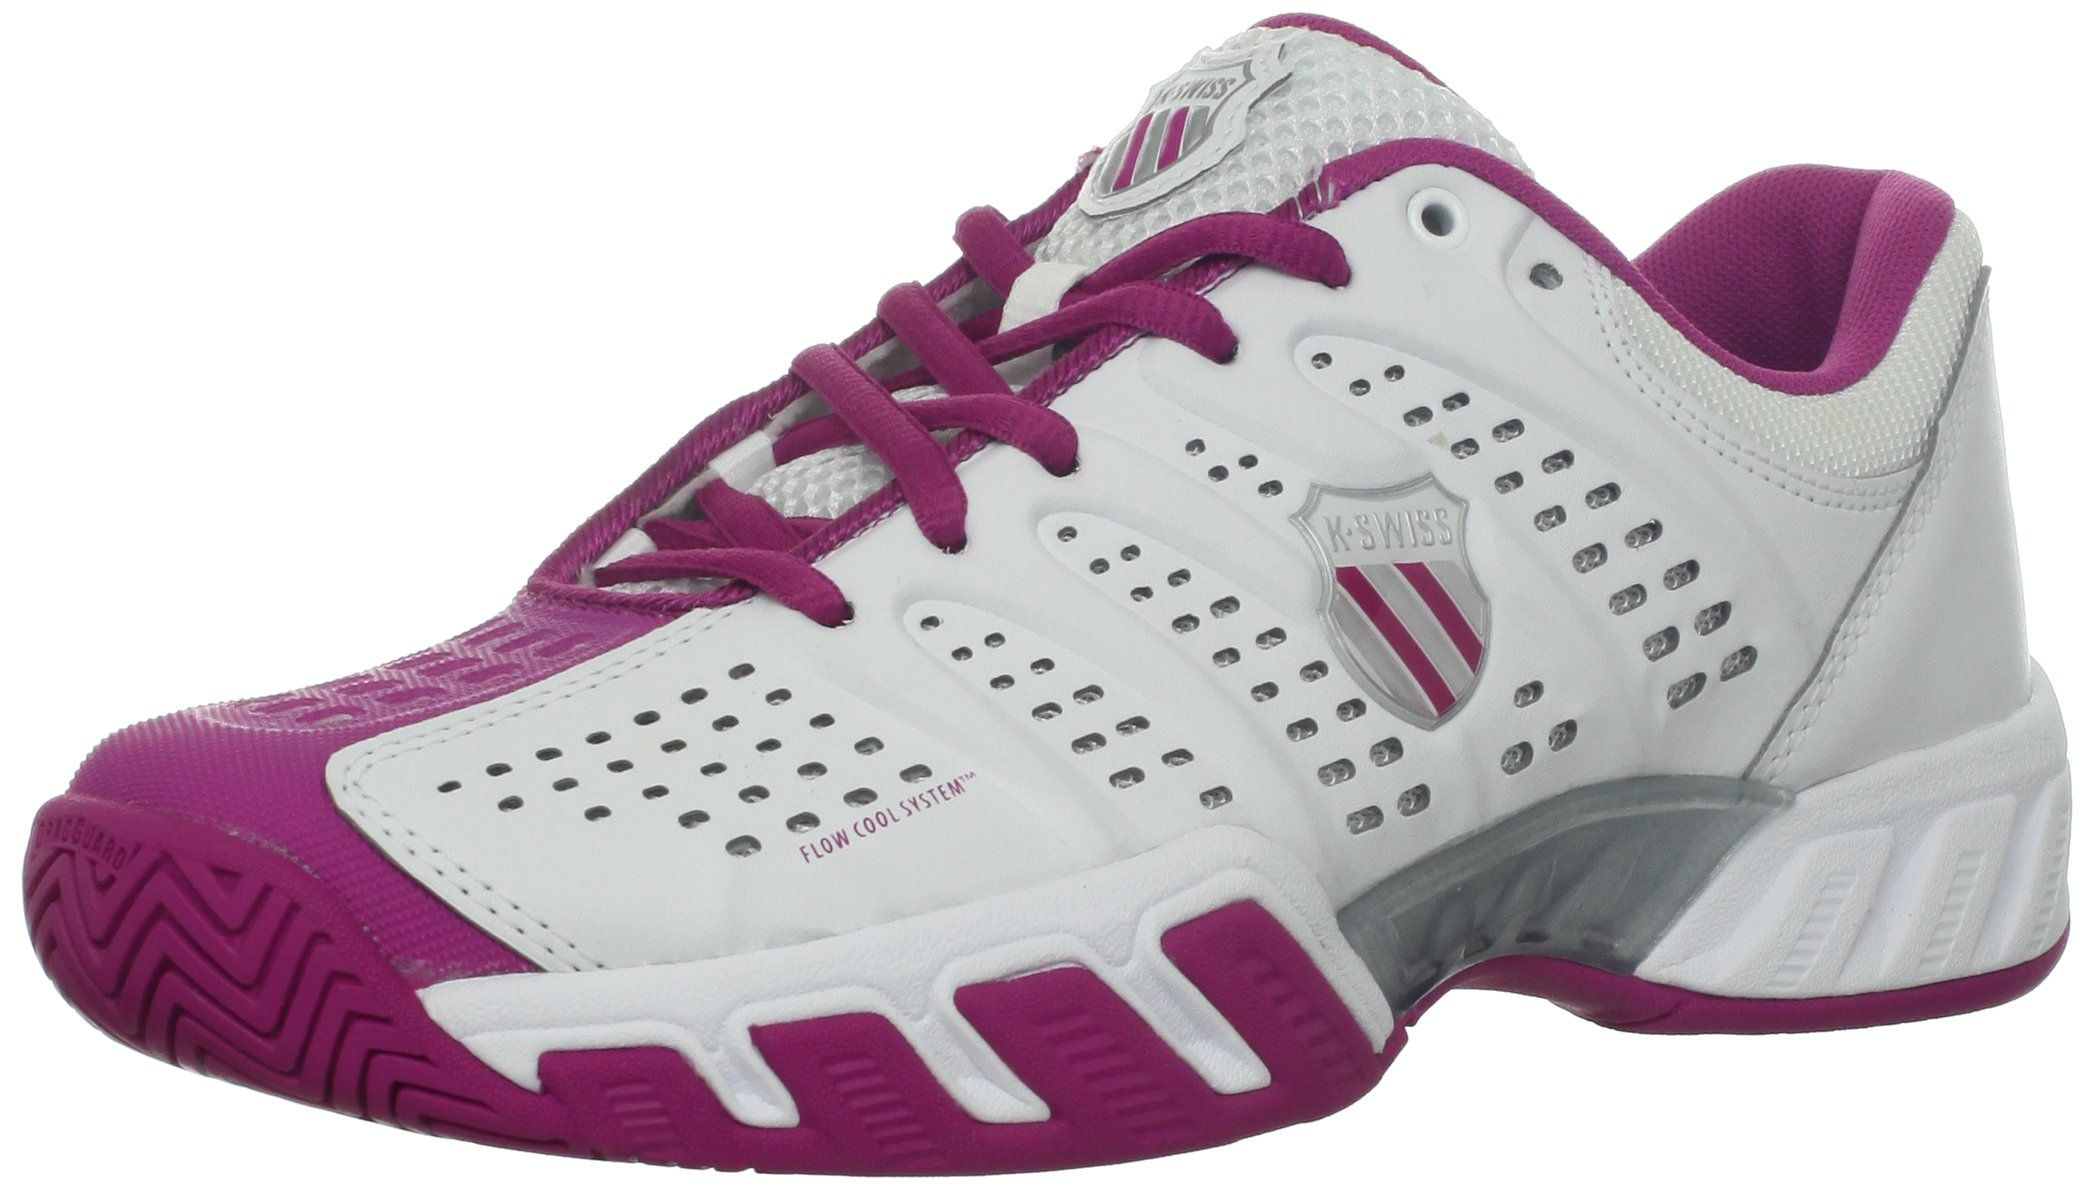 046d6b7c13534 leather $70 Amazon.com: K-Swiss Women's Bigshot Light Tennis Shoe ...